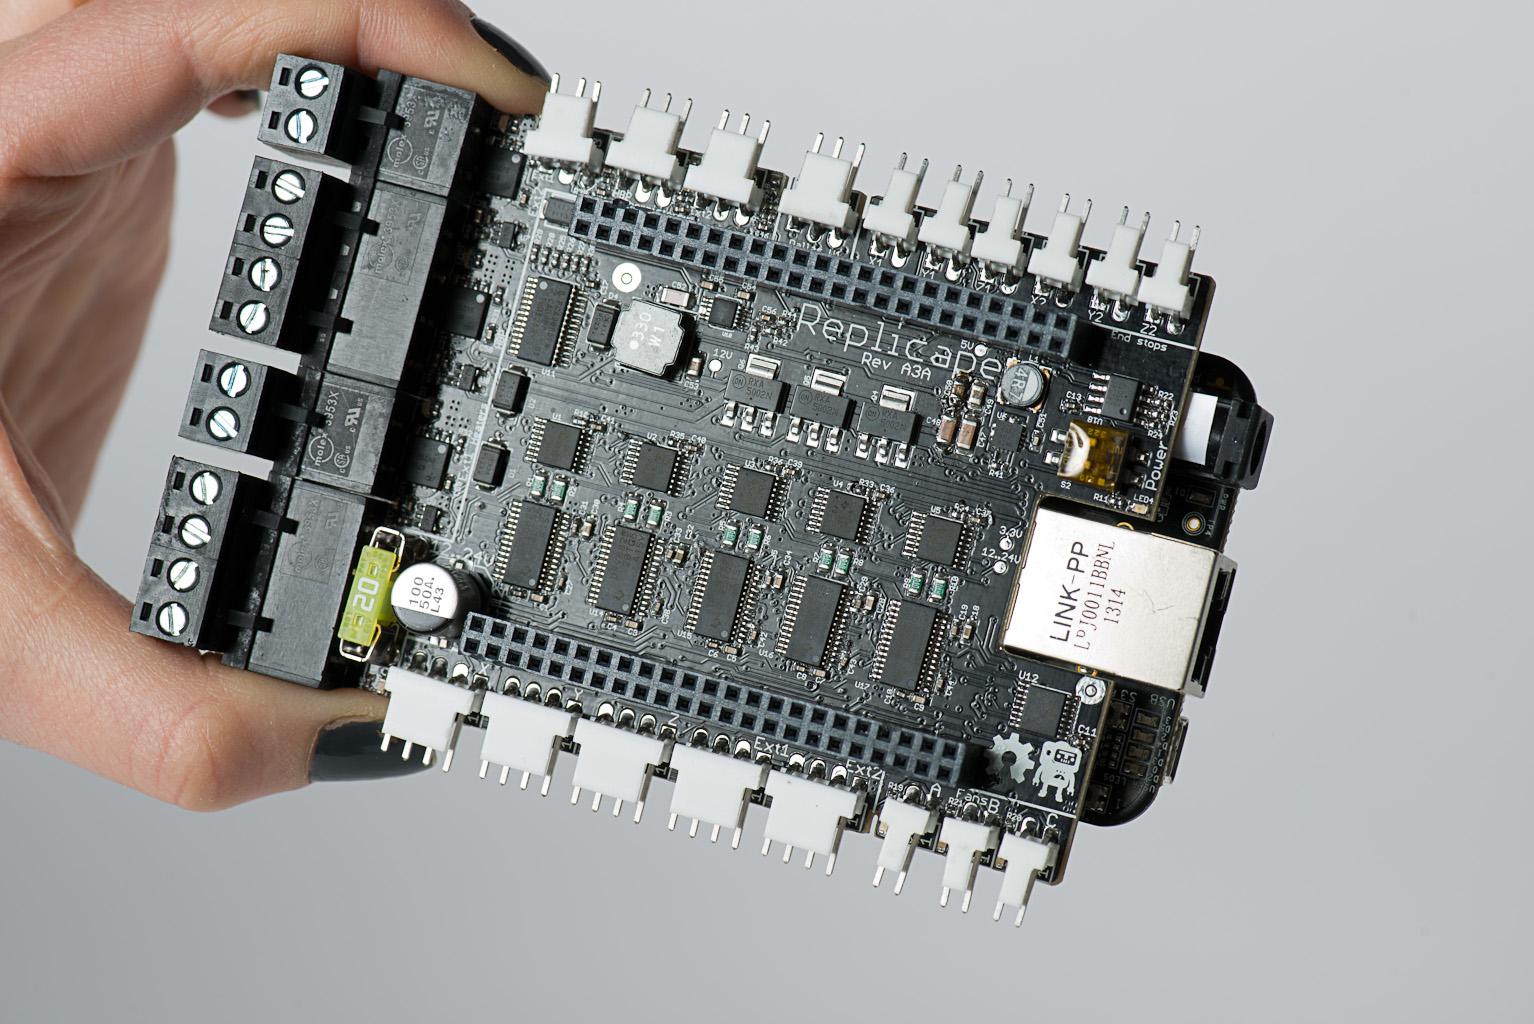 BBB - BeagleBone Black I/O GPIO Library for C